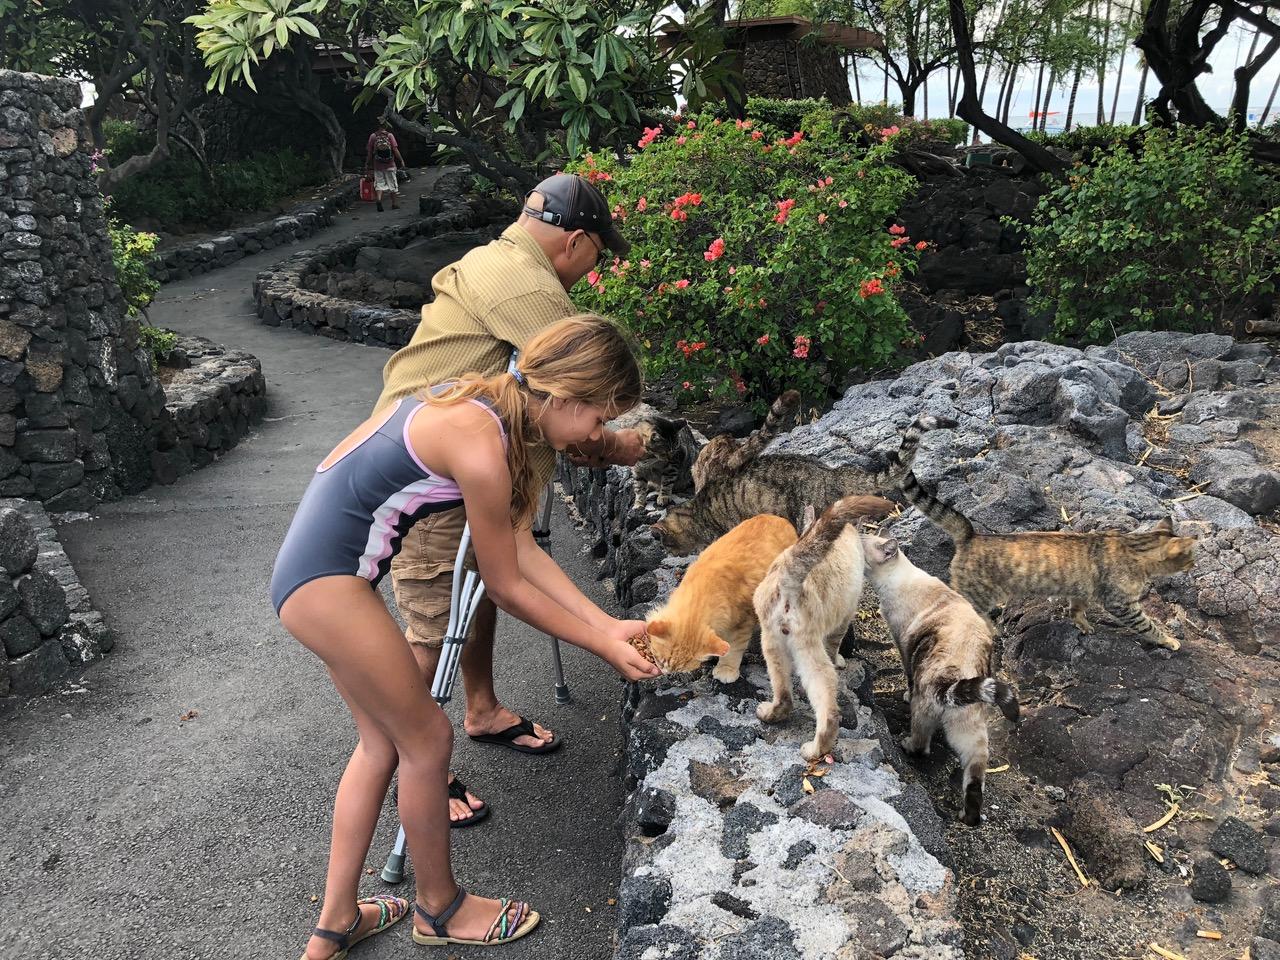 Big Island has a lot of wild cats...